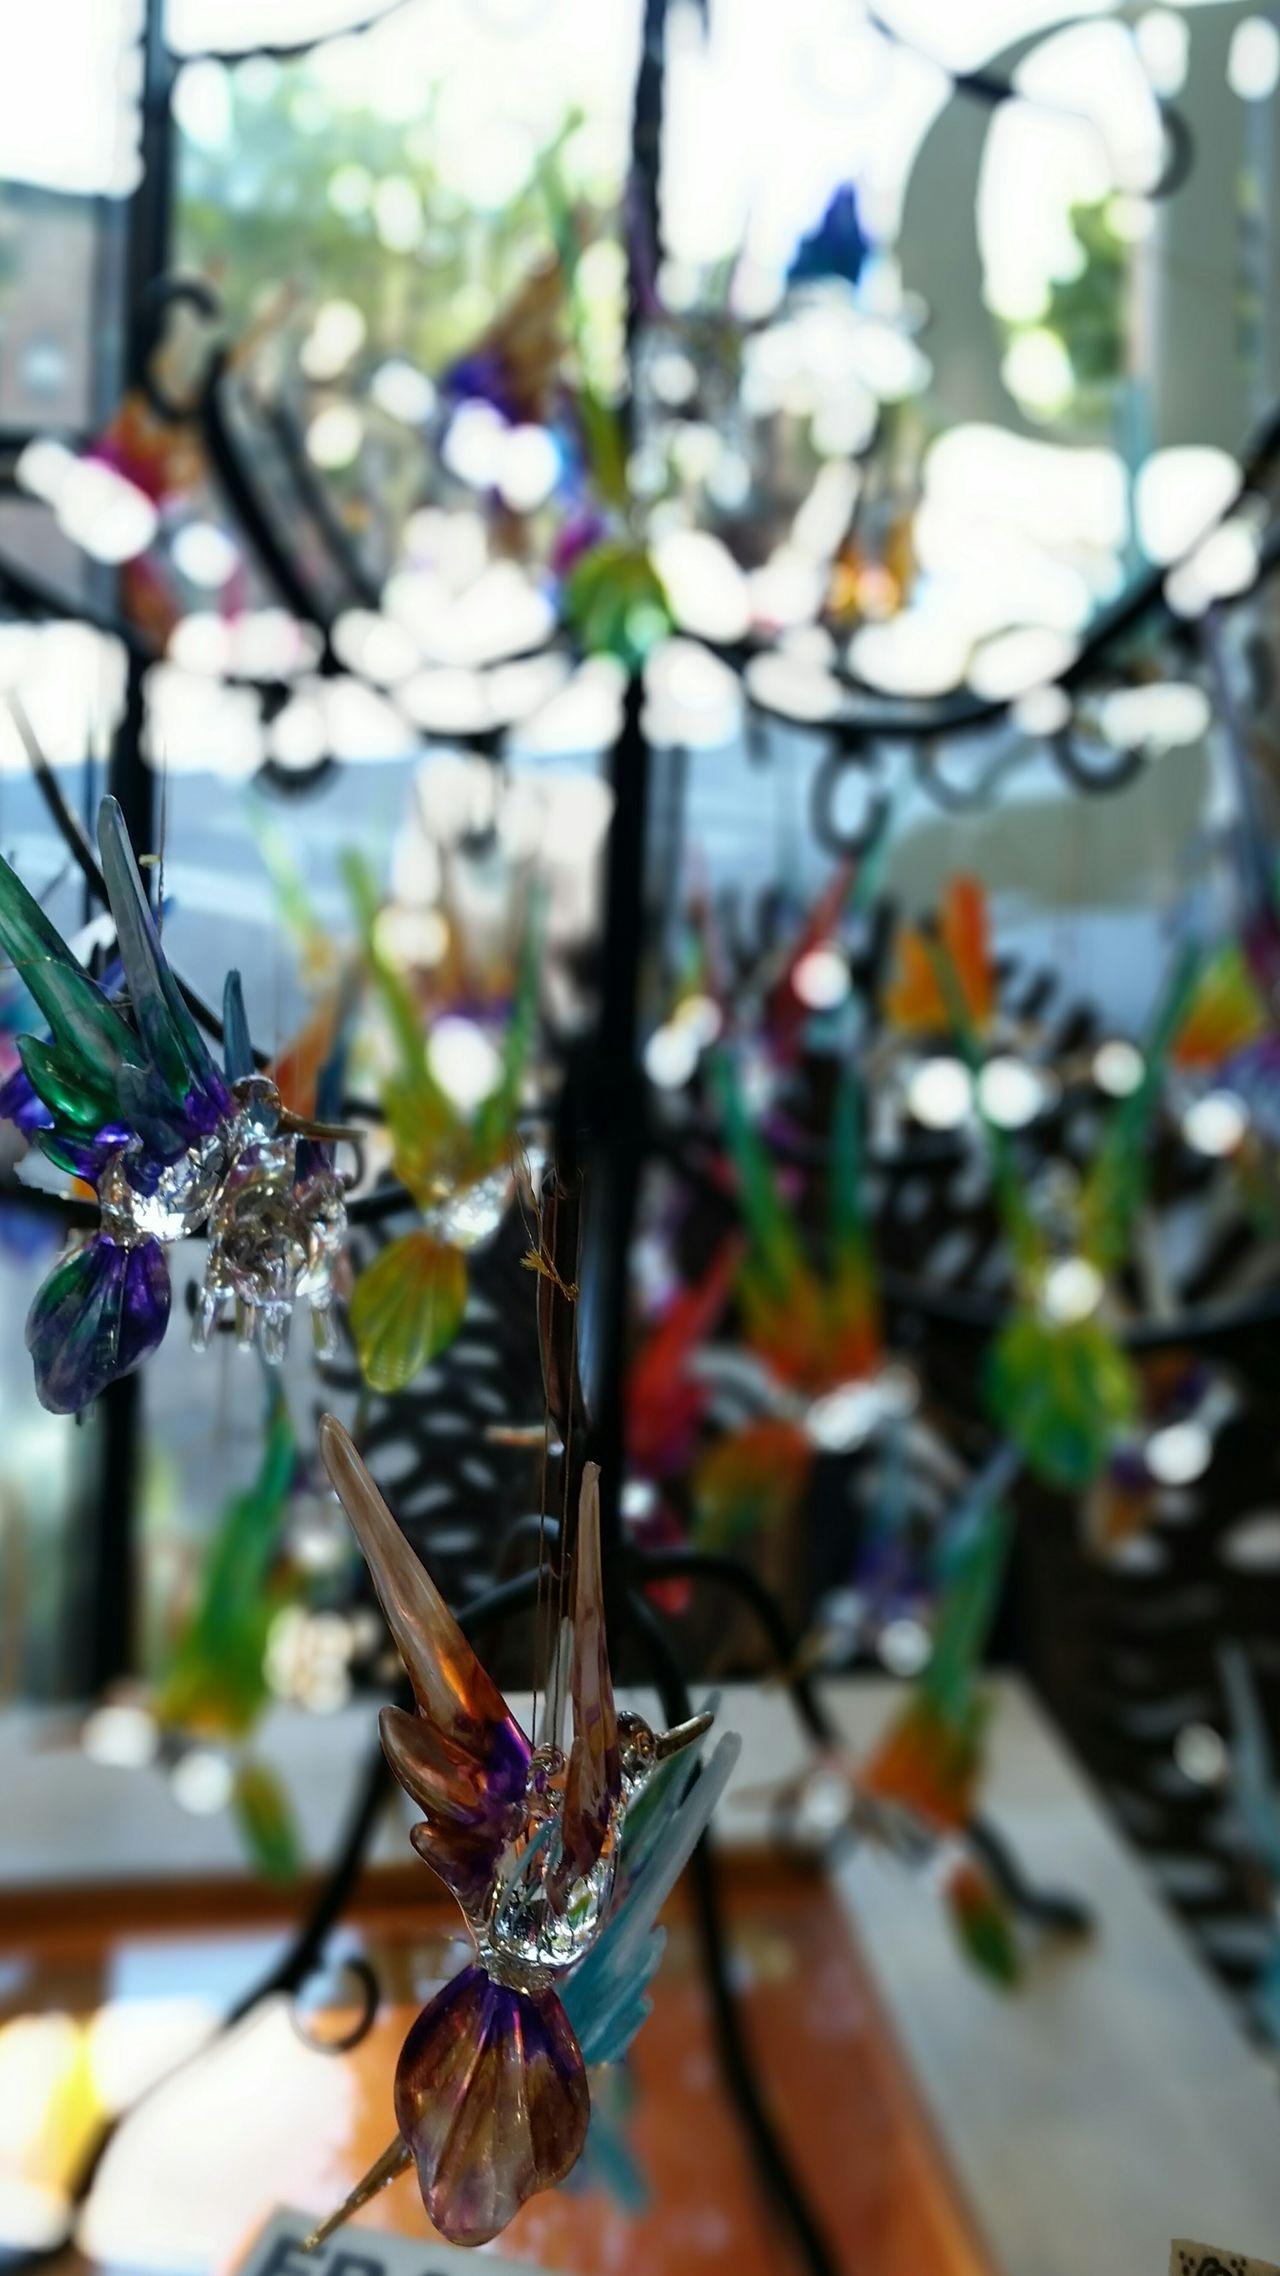 Hummingbirds in glass Hummingbird Hanging Hummingbirds Of Glass Glass Figurines Christmas Decoration Crystals Jewelry Jewelry Design Crystal Display